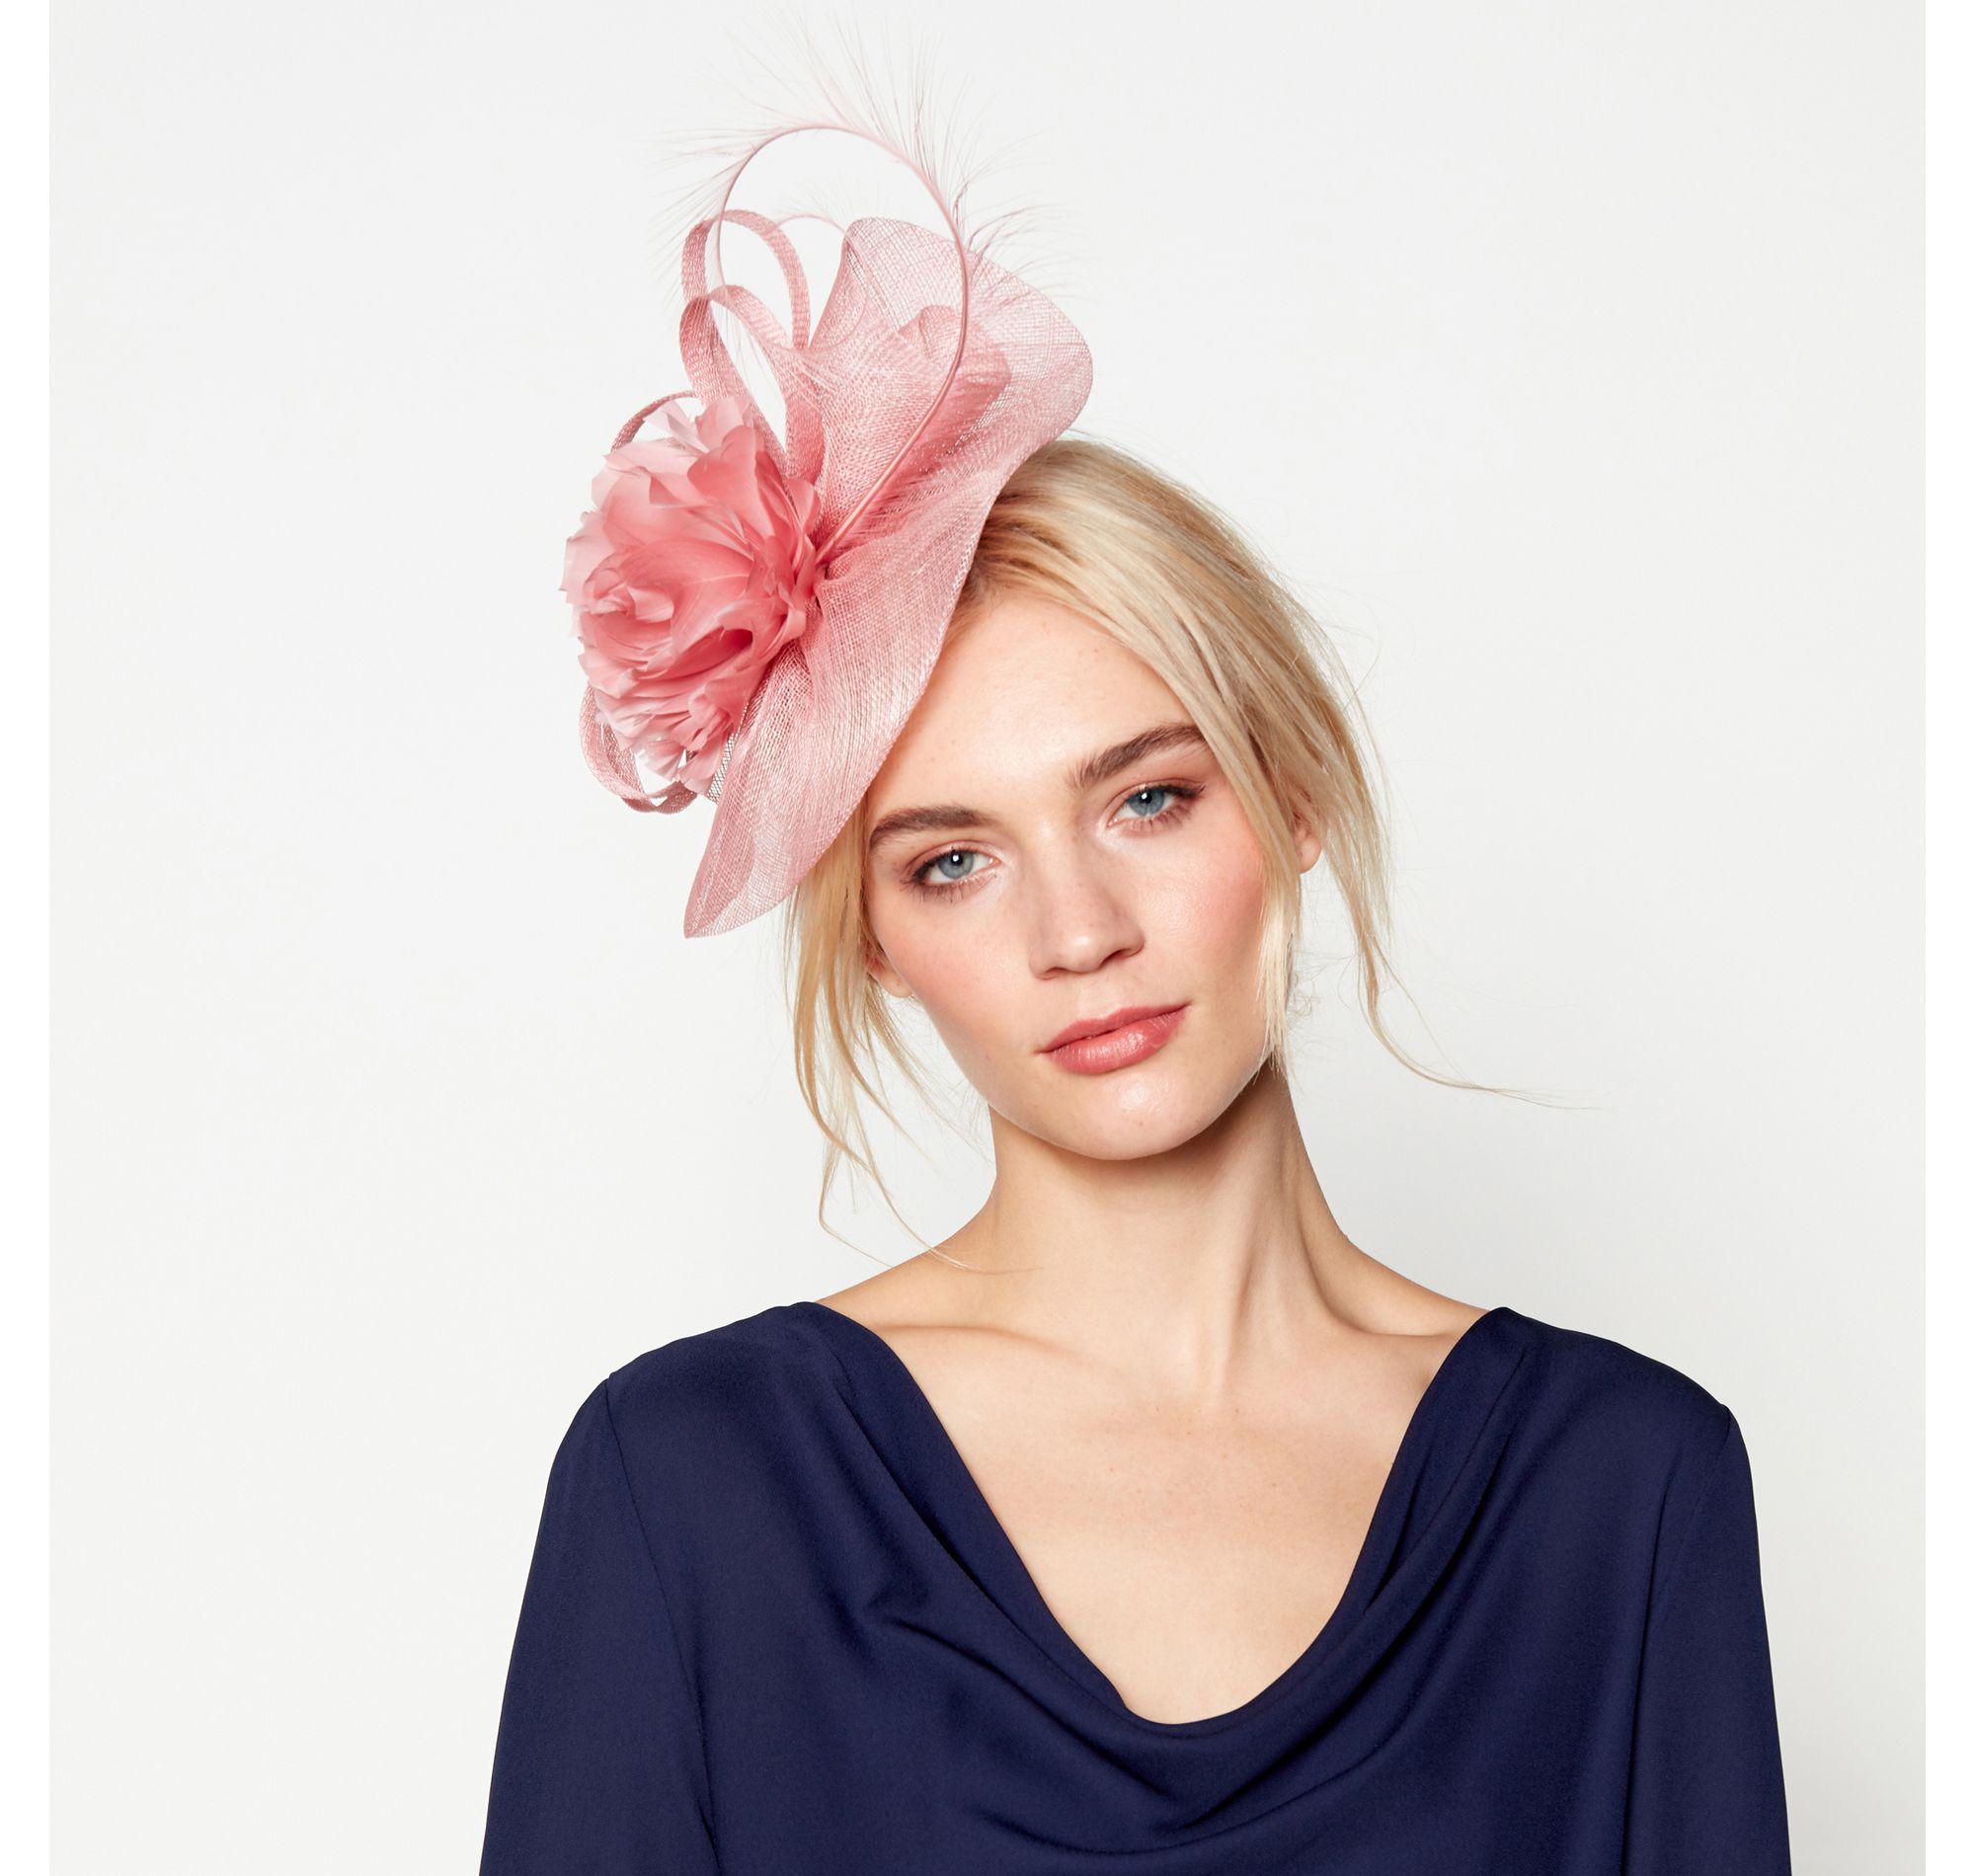 J By Jasper Conran Pink  camelia  Wave Fascinator Headband in Pink ... 87d47df4f0d